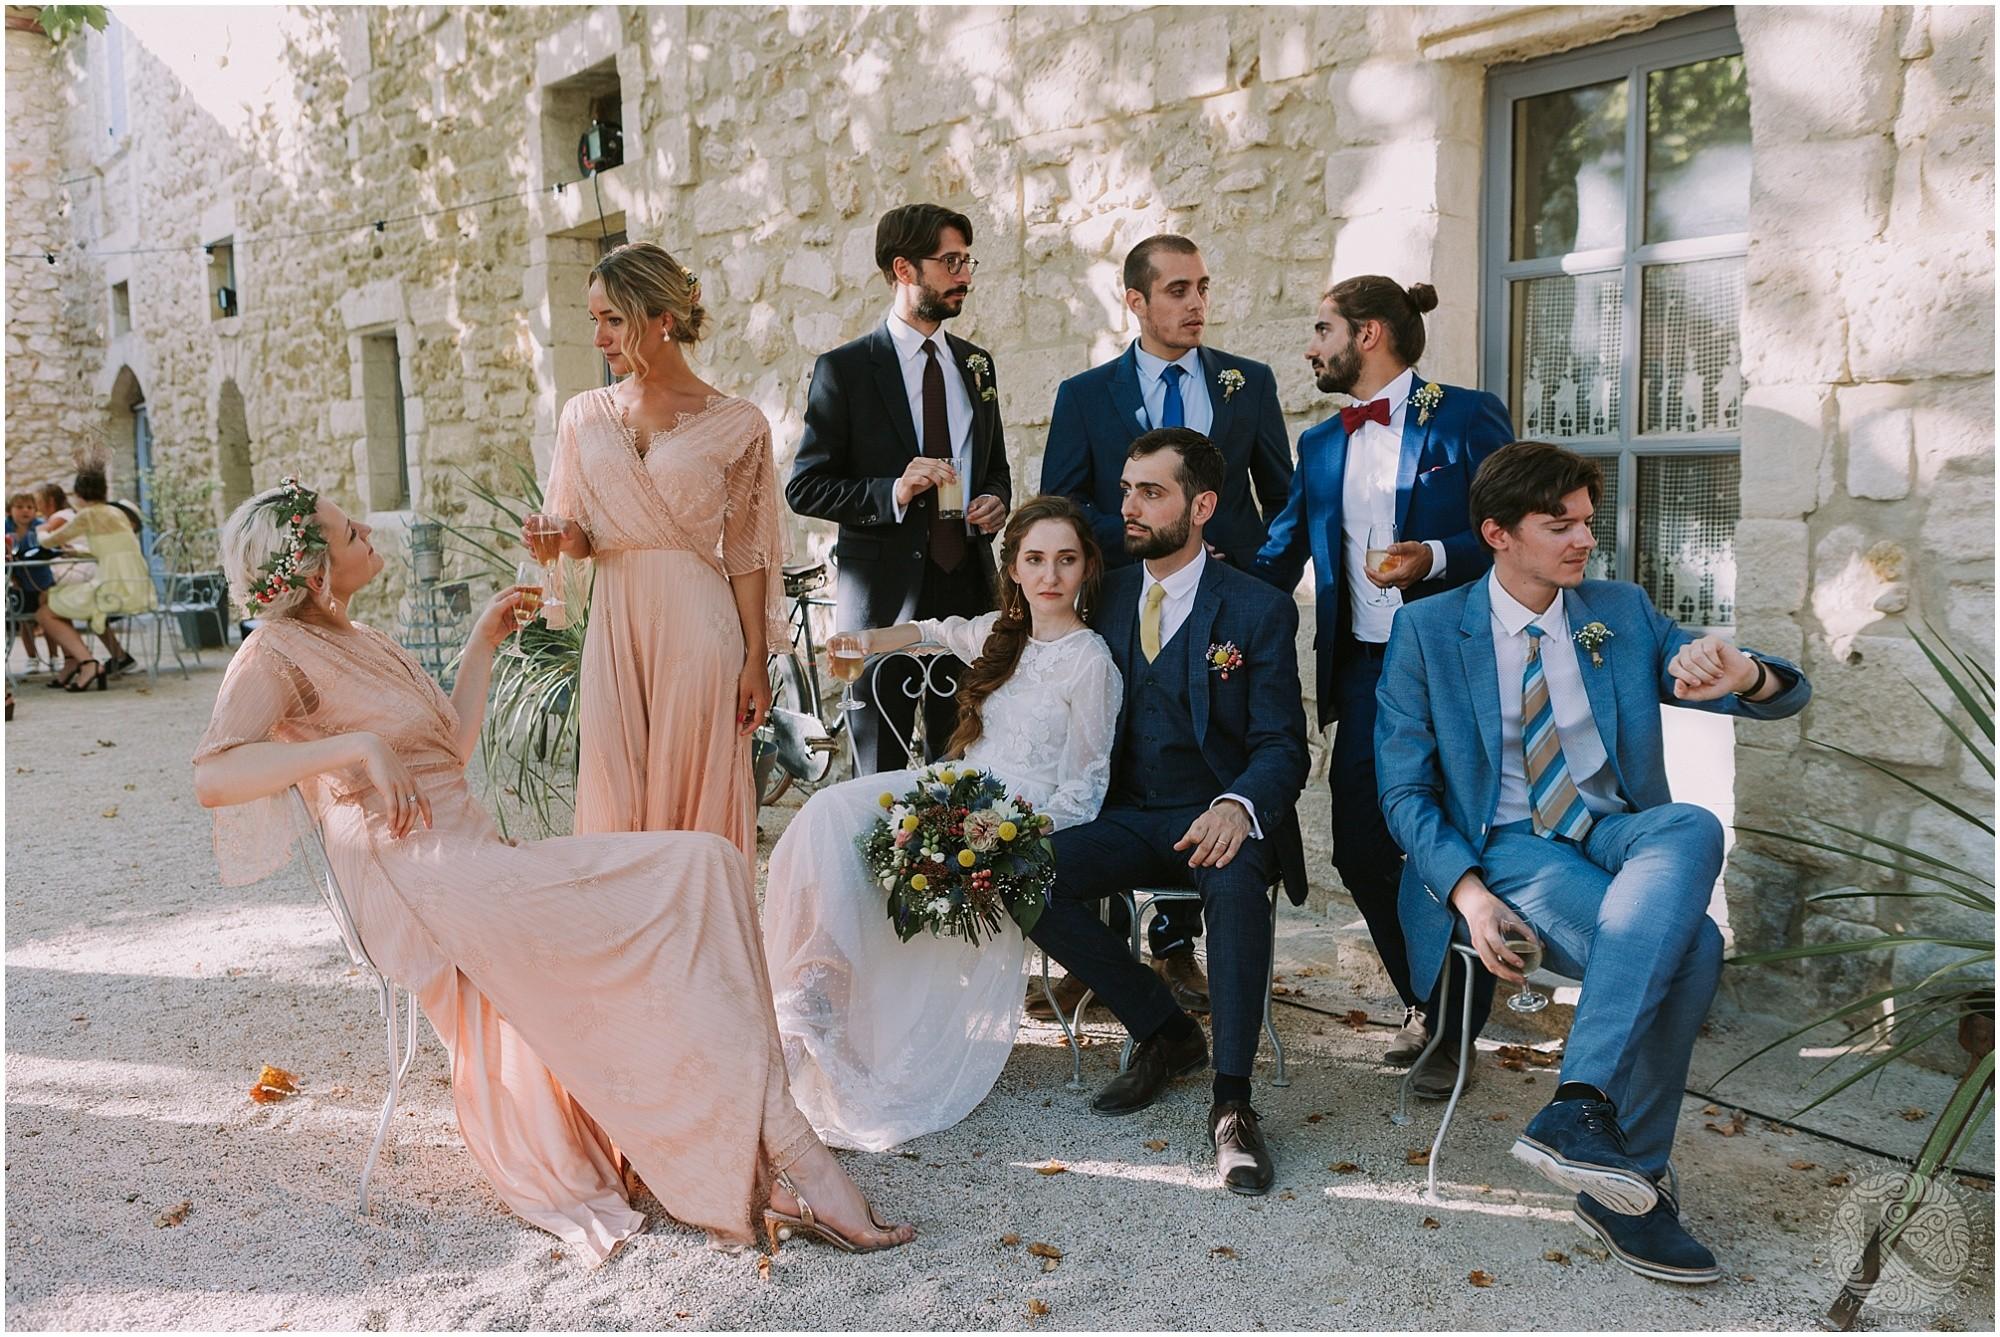 Kateryna-photos-photographe-mariage-vaucluse-provence-avignon-ferme-st-hugues_0062.jpg